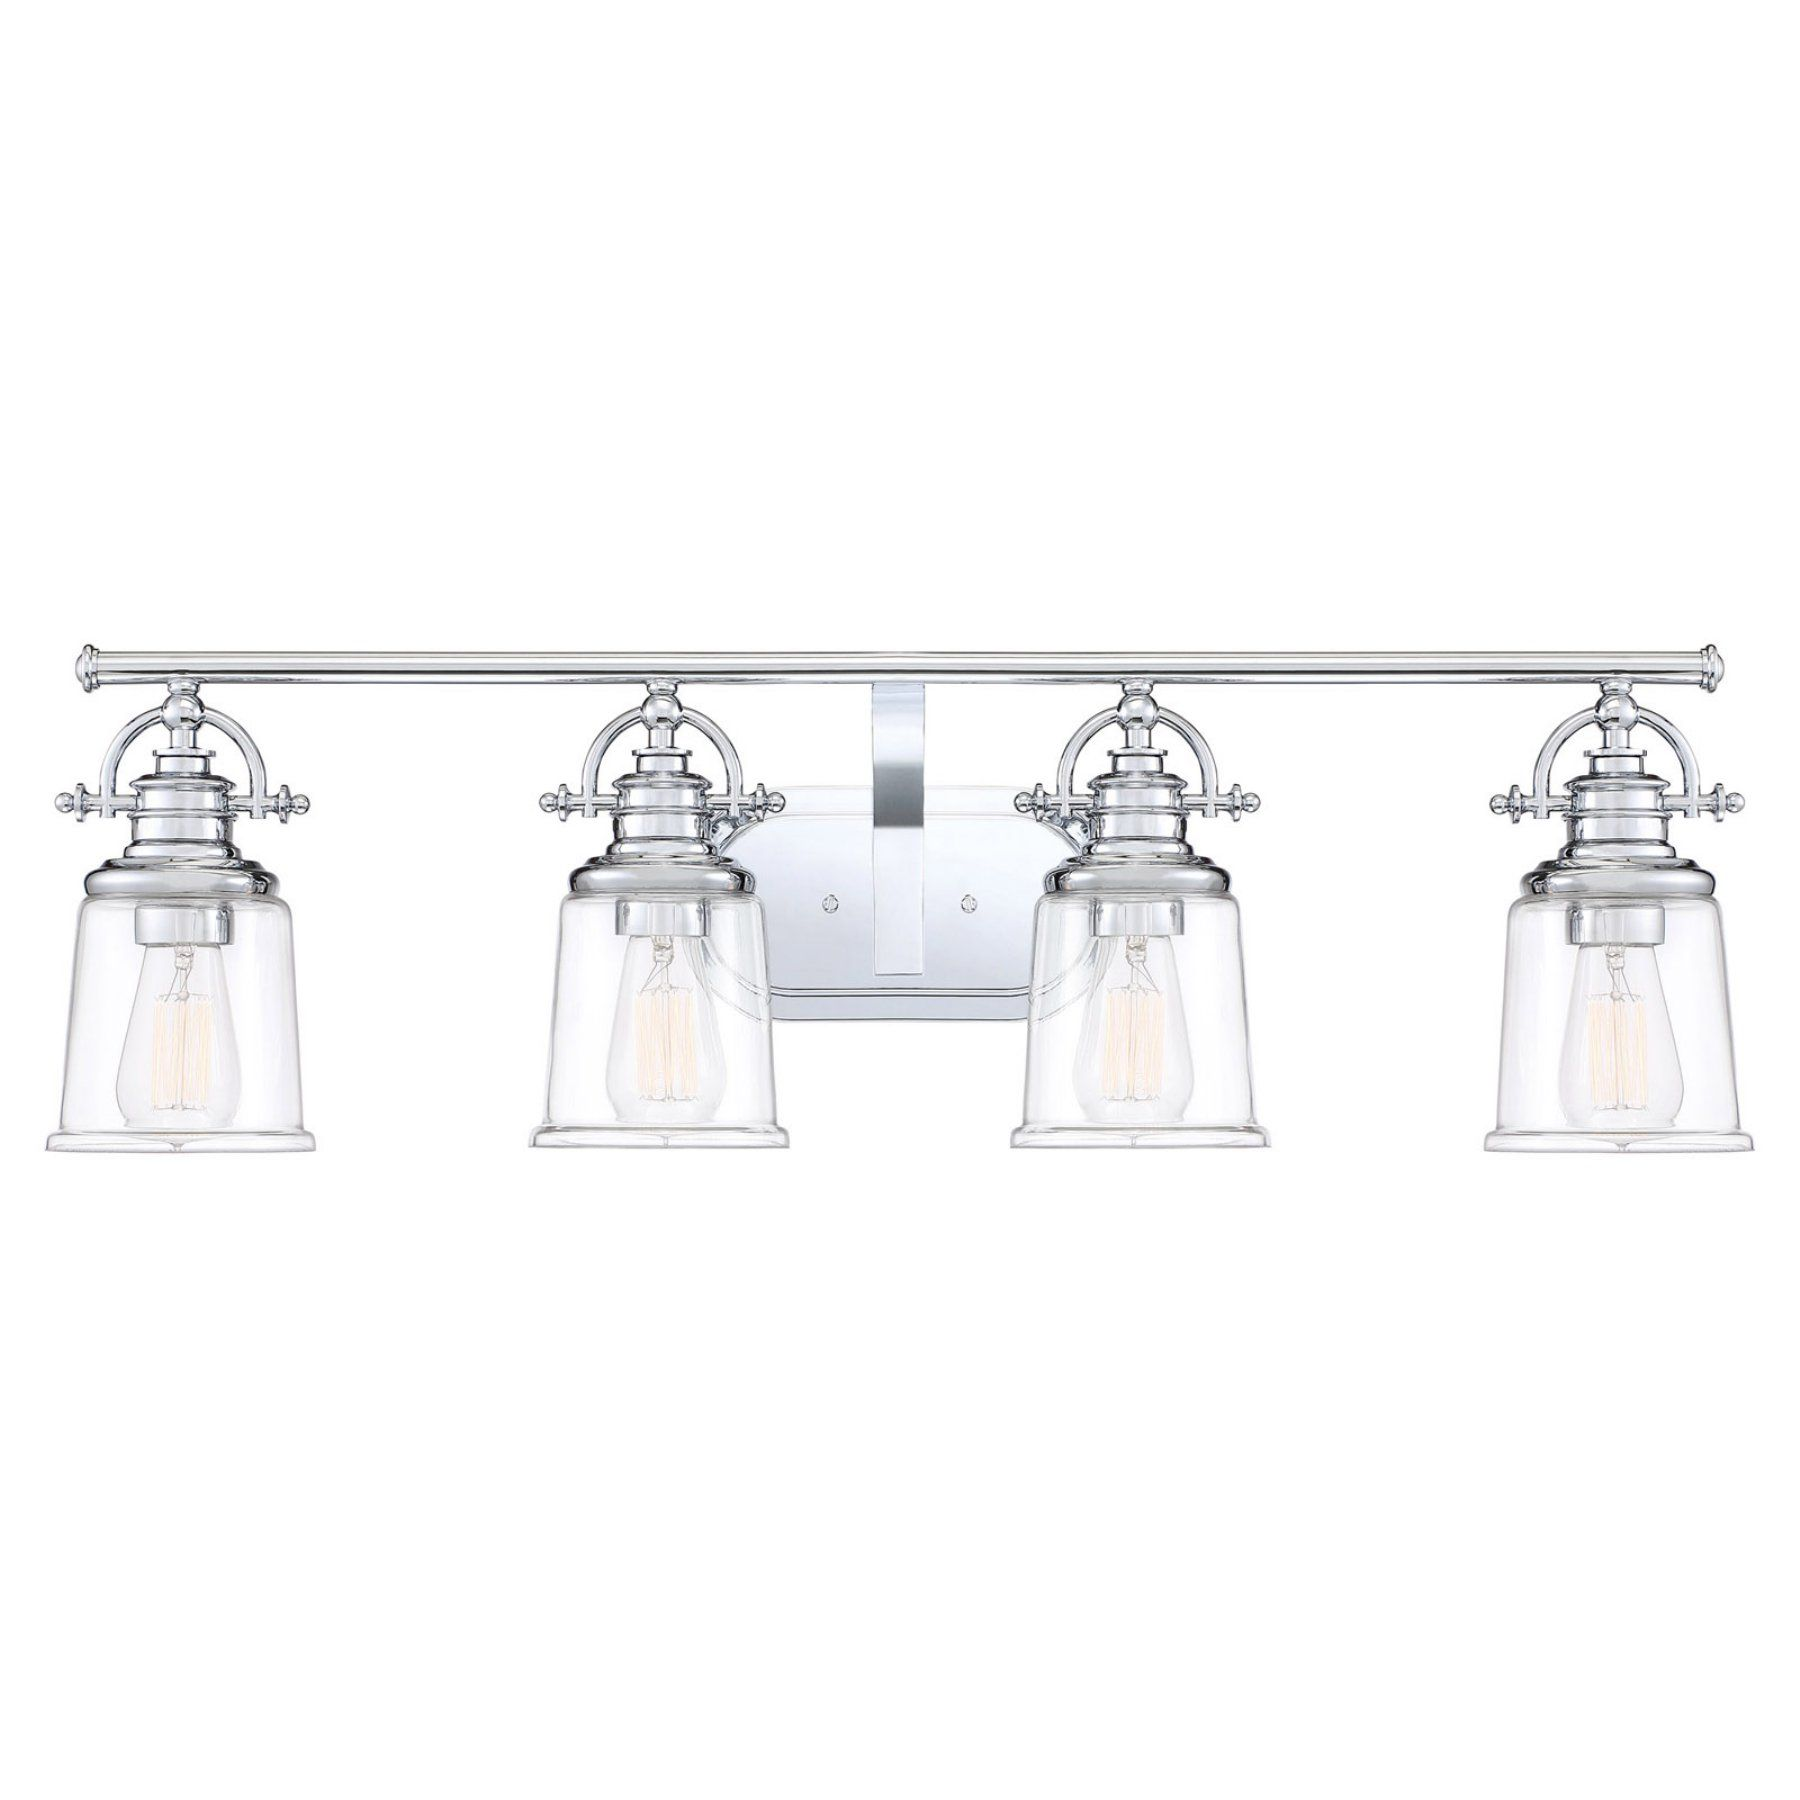 Quoizel grant 4 light bathroom vanity light